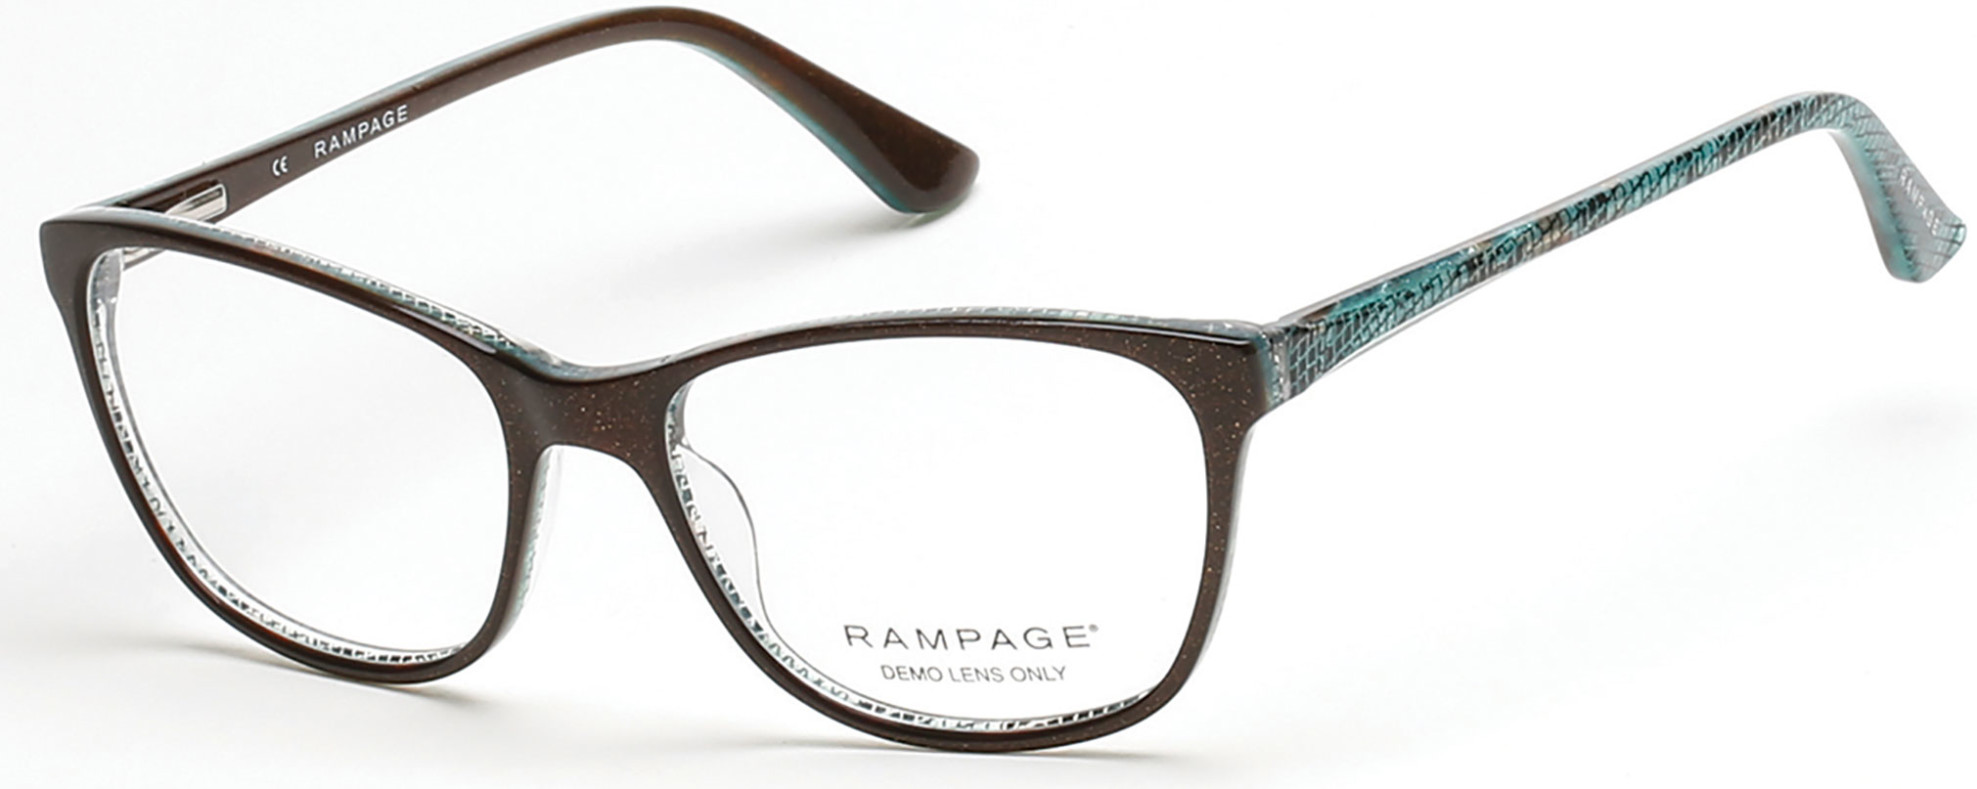 RAMPAGE RA0155 style-color 048 - shiny dark brown